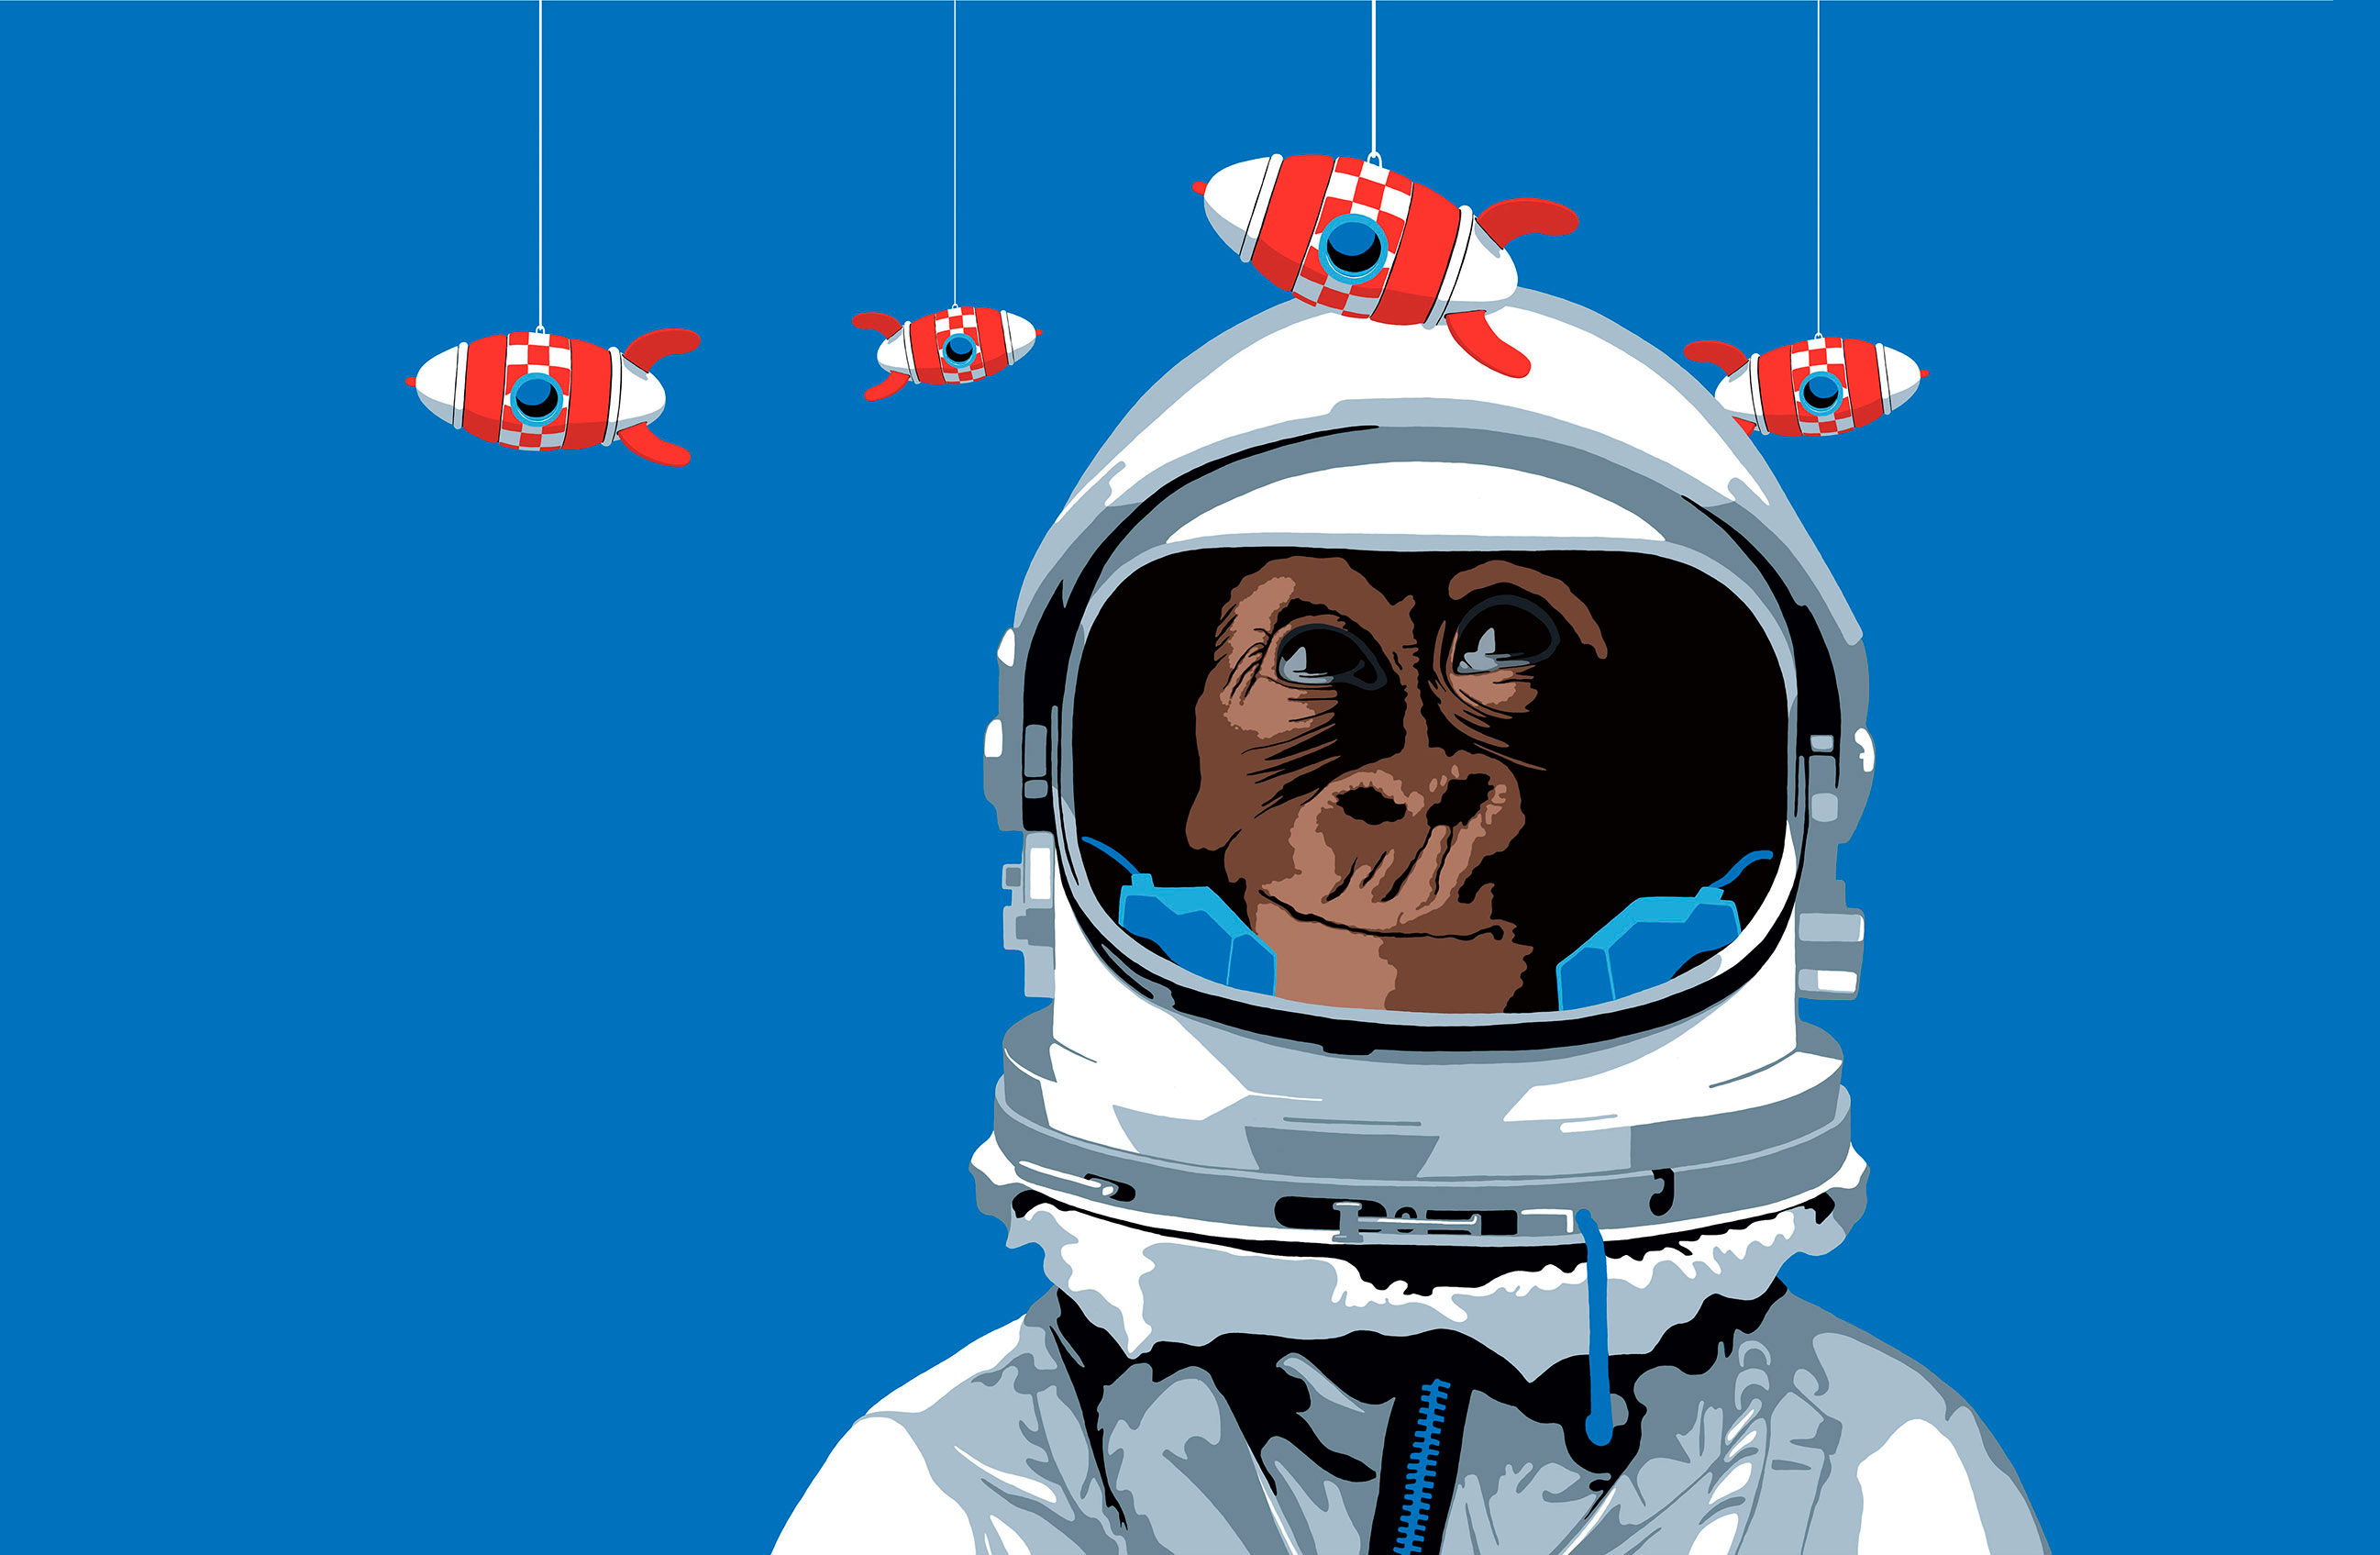 Les-heros-de-l-espace-Frederic-Marais